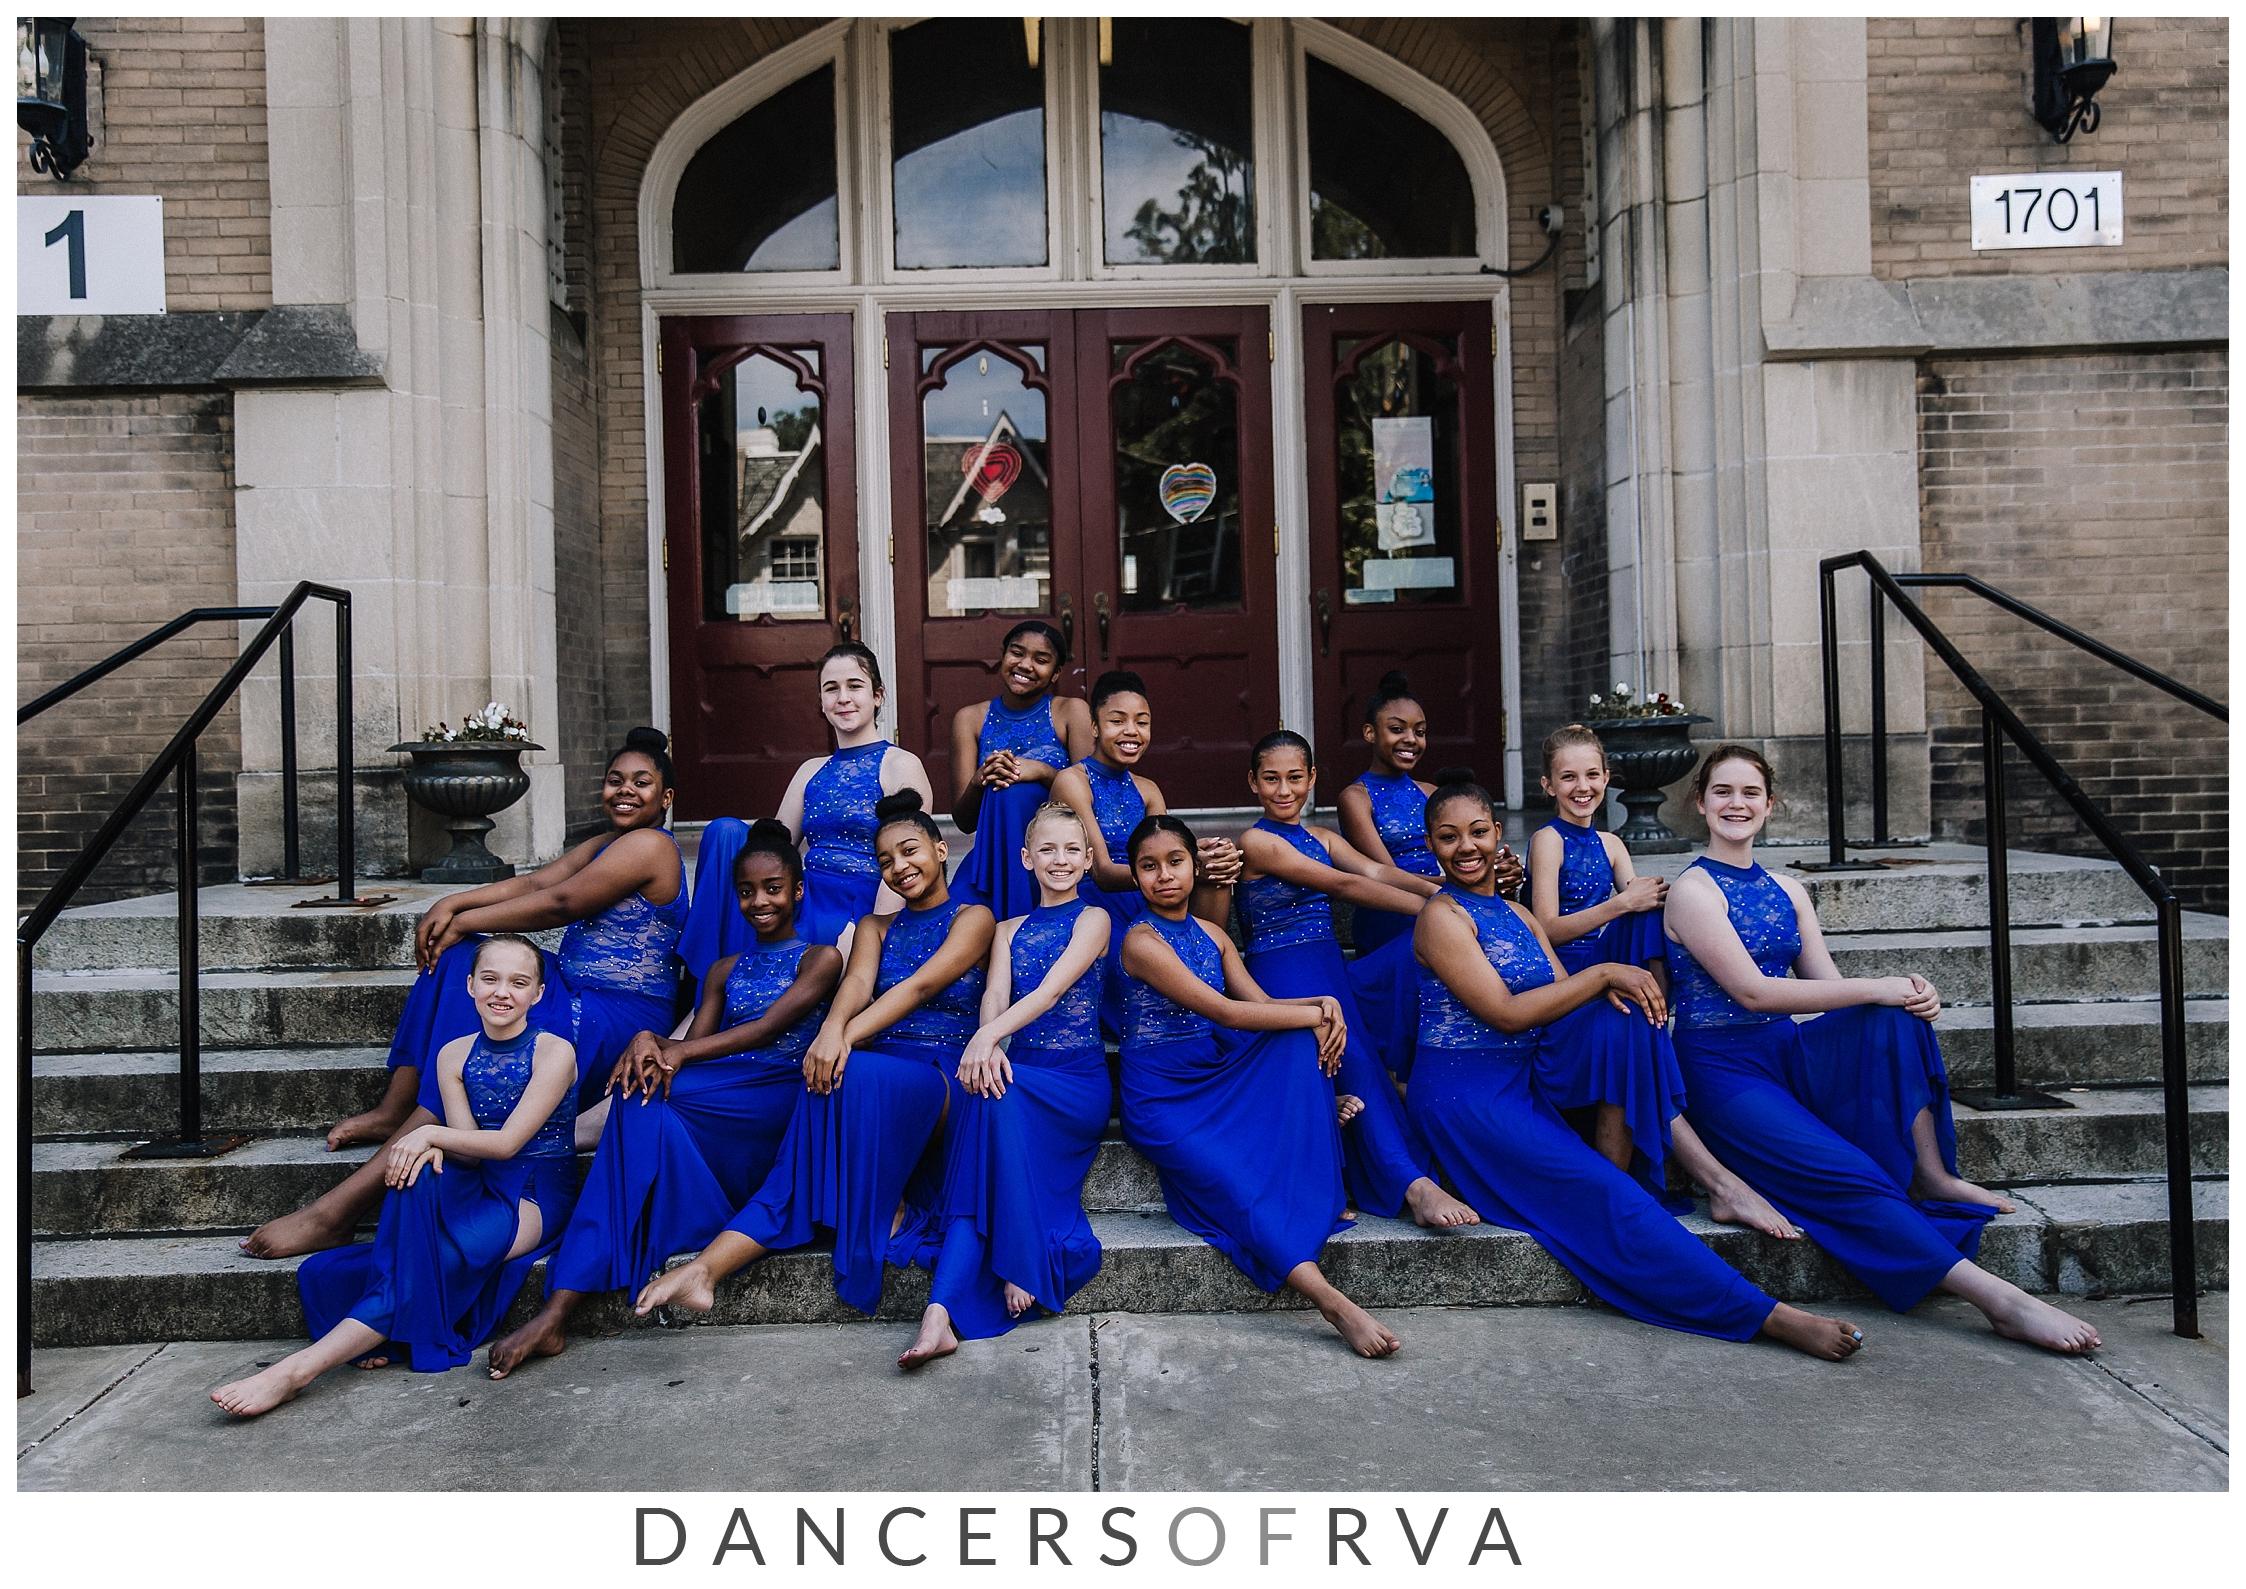 Richmond-Dance-Project-Binford-Dance-Company-Dancers-of-RVA_0003.jpg